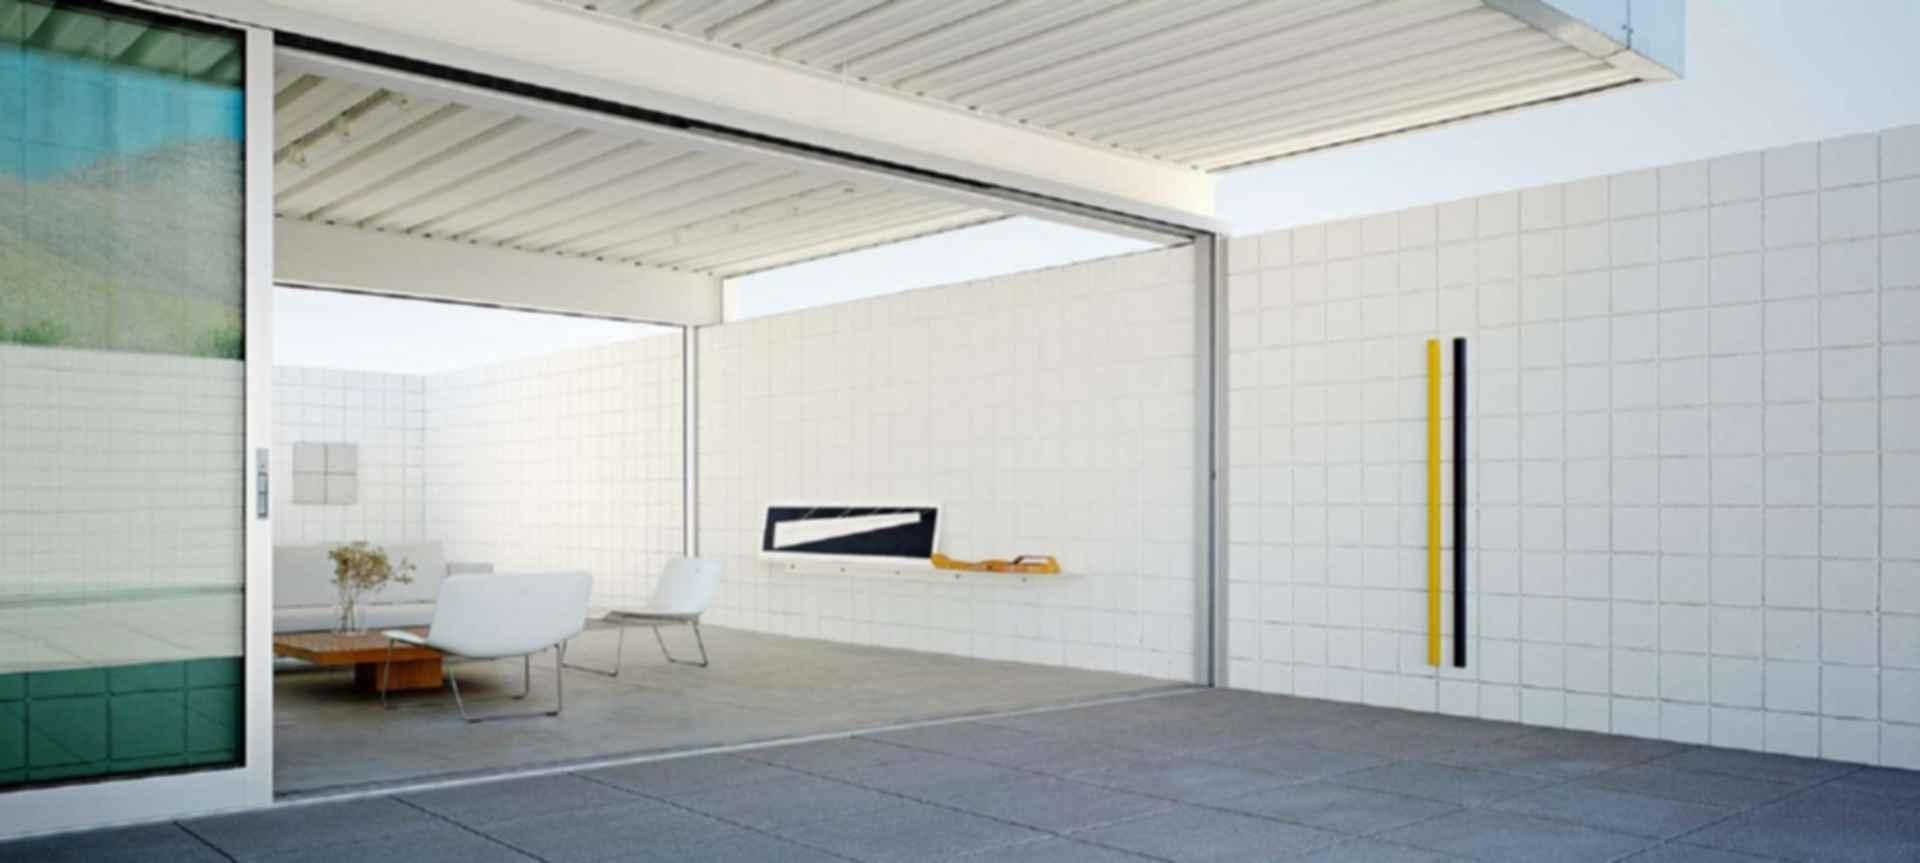 Desert House - interior/exterior